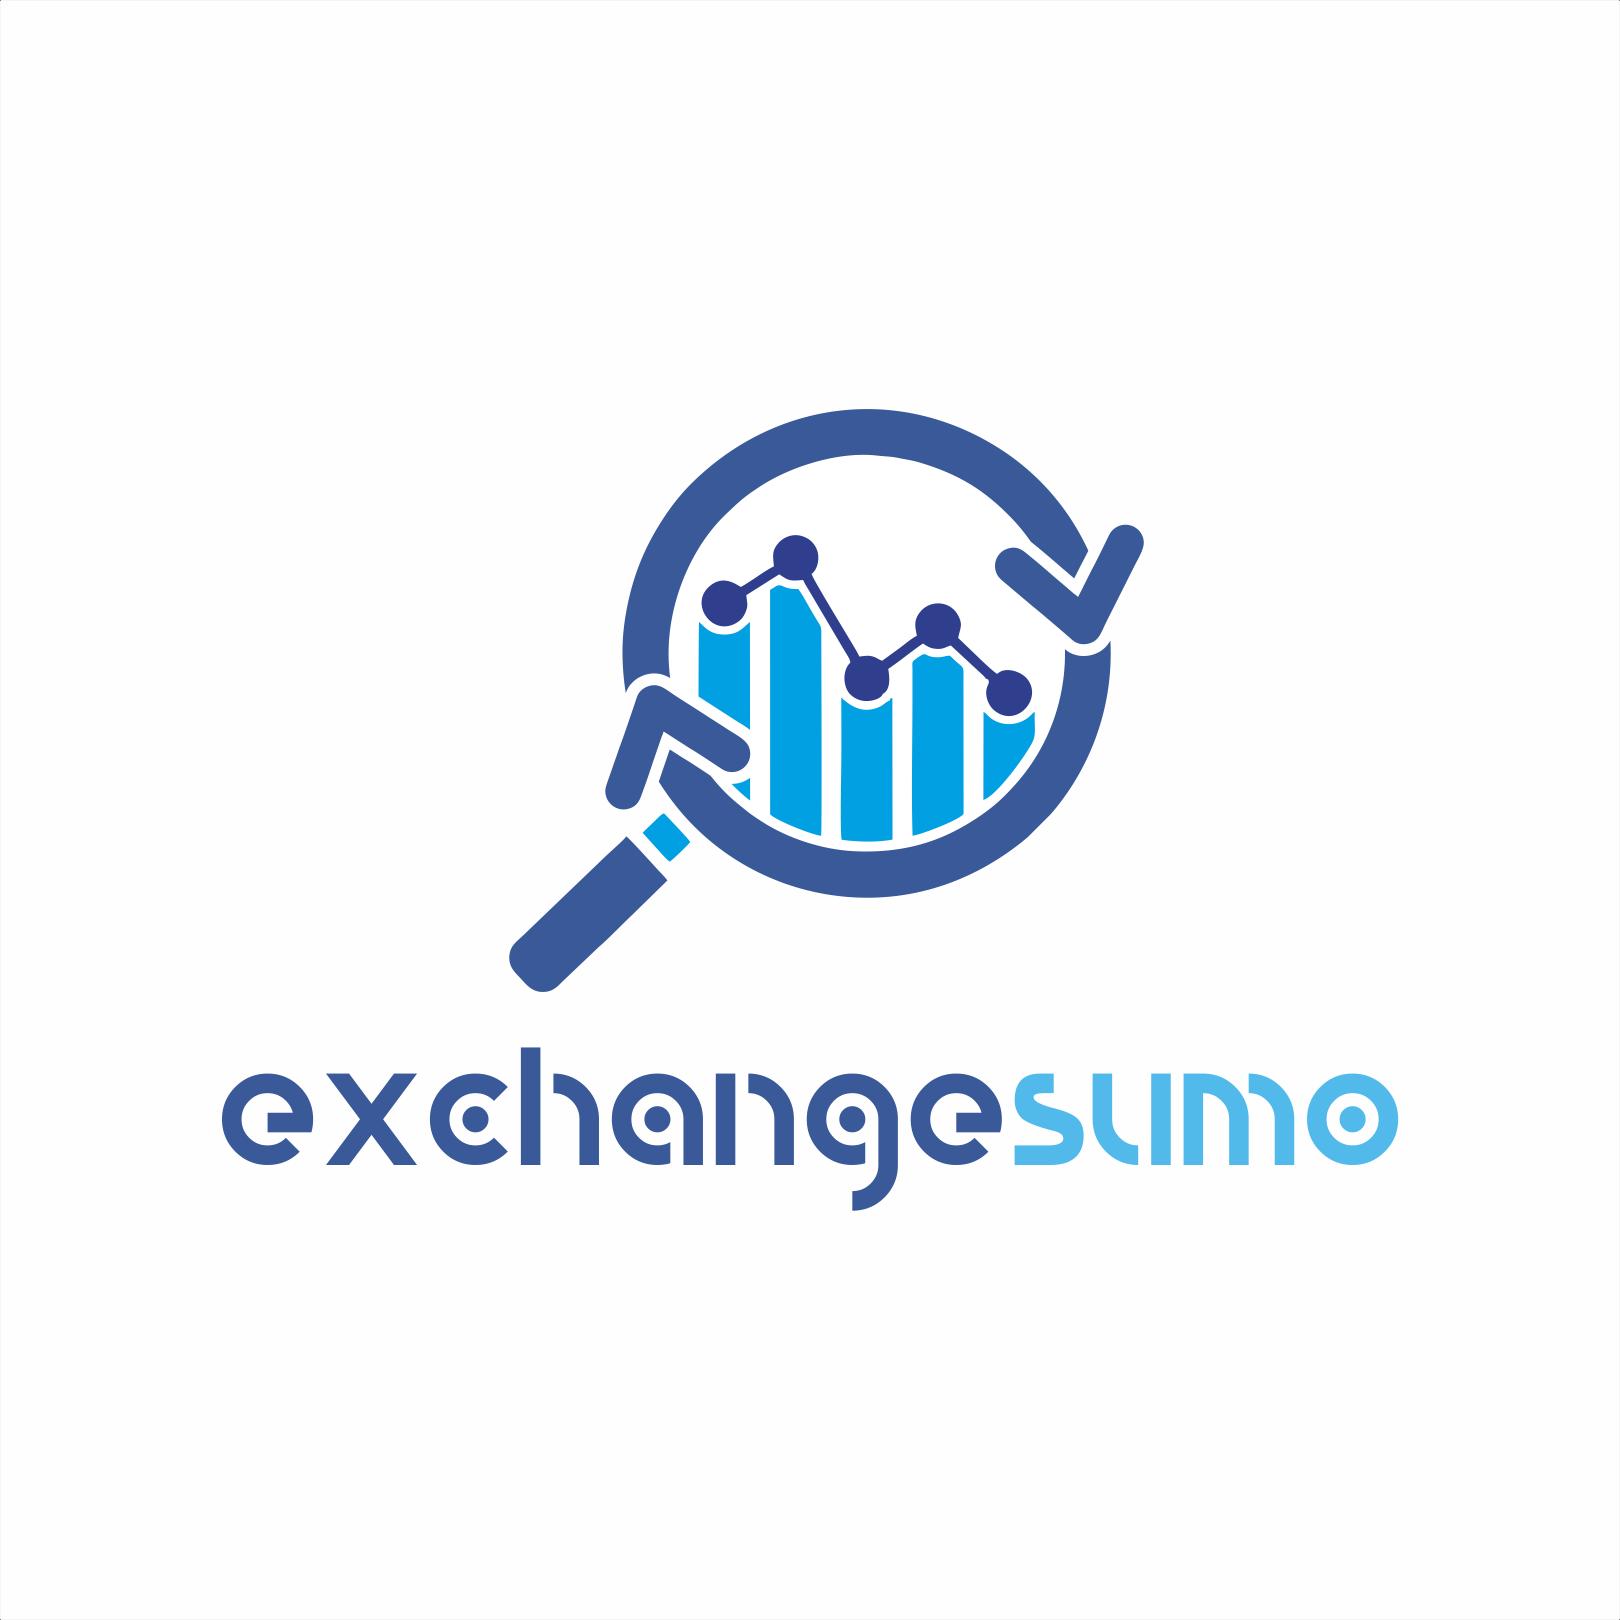 Логотип для мониторинга обменников фото f_4695bab92724903b.png